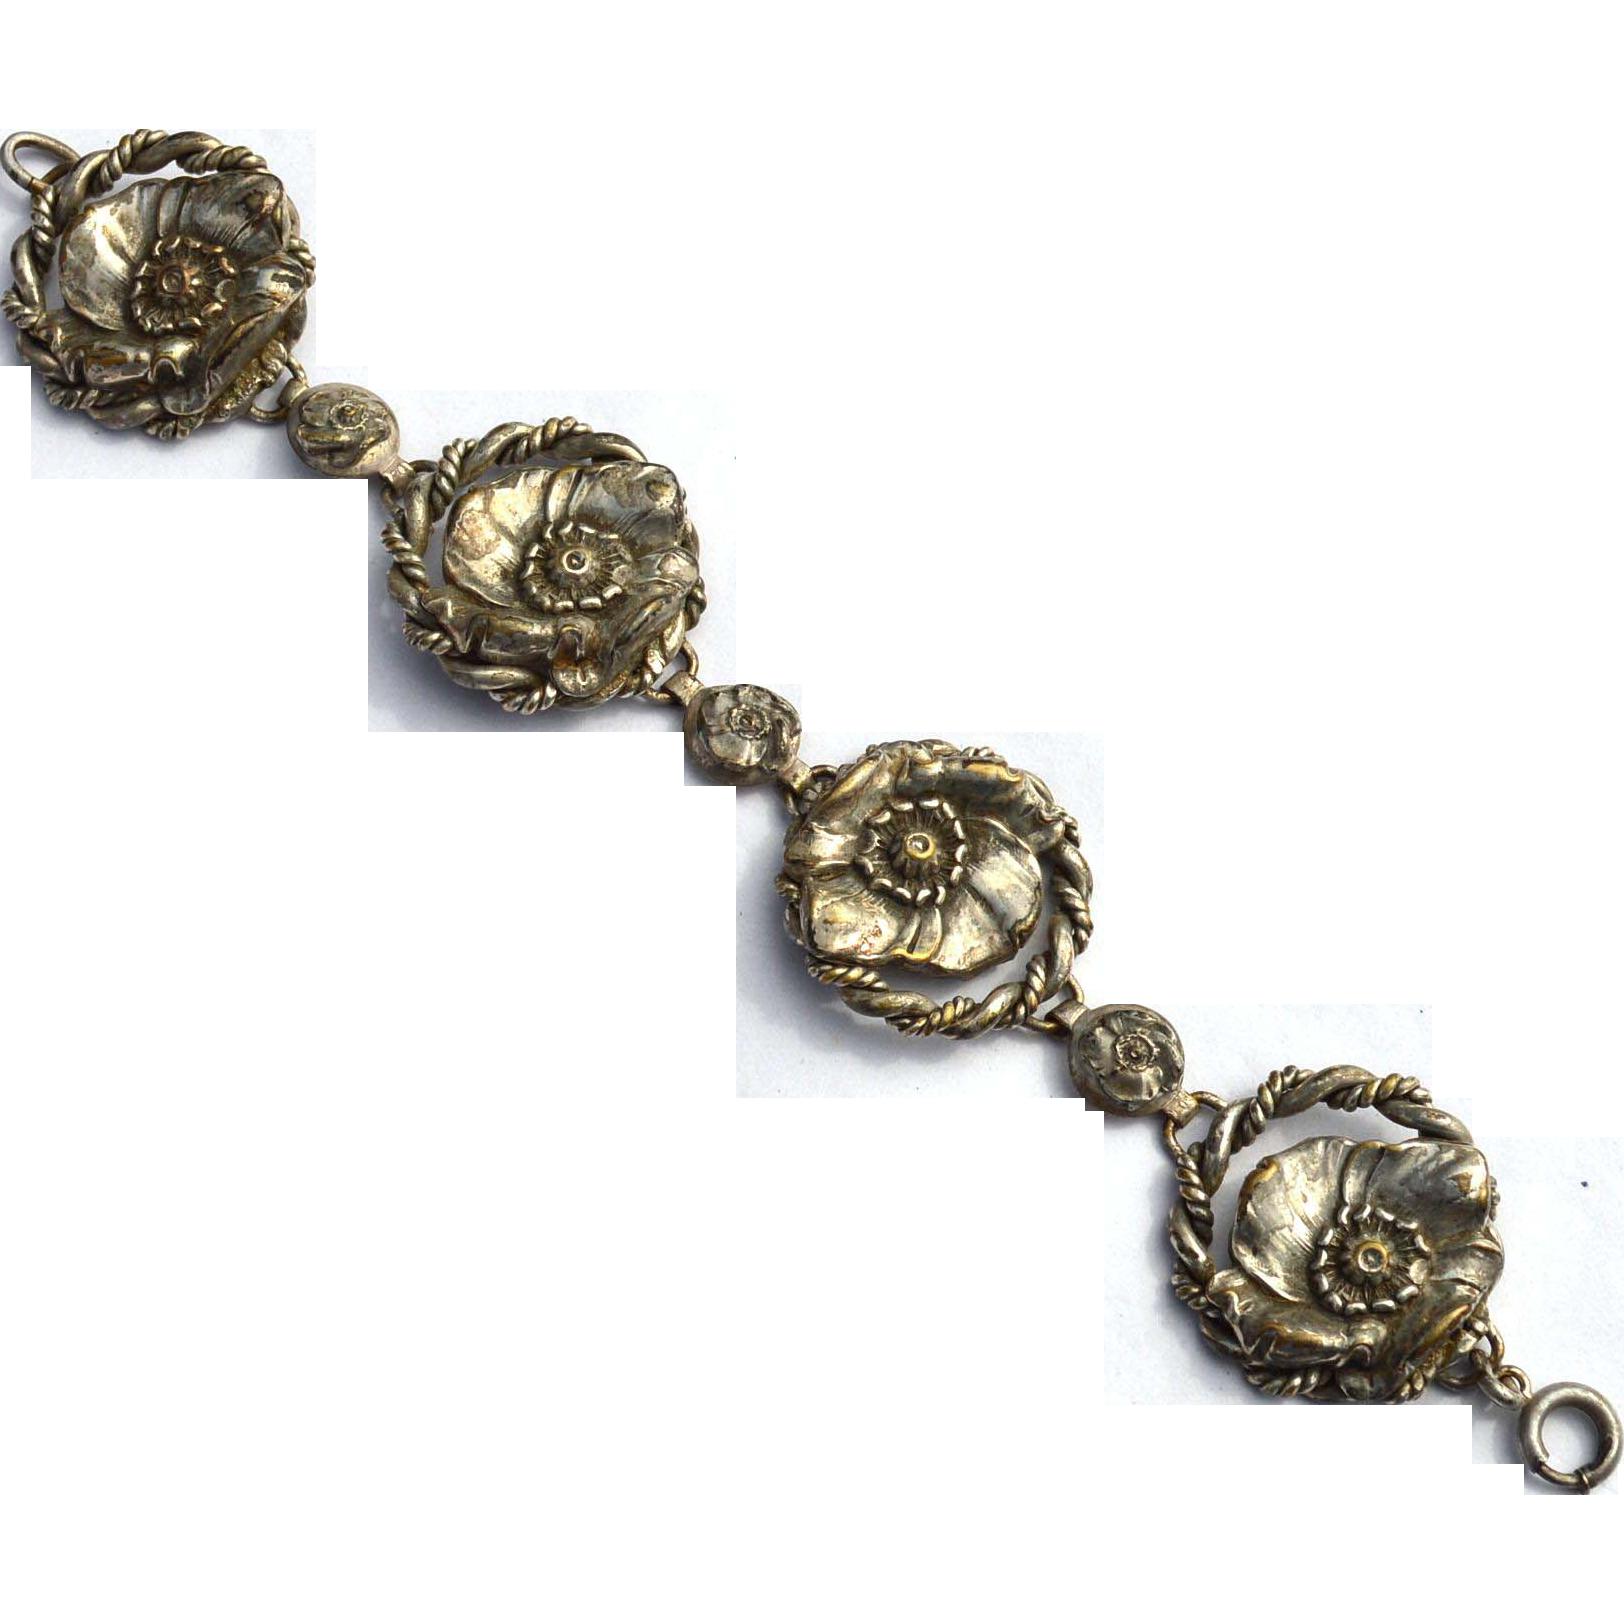 Art Nouveau Era Silver Plate Flower Bracelet, Very Ornate